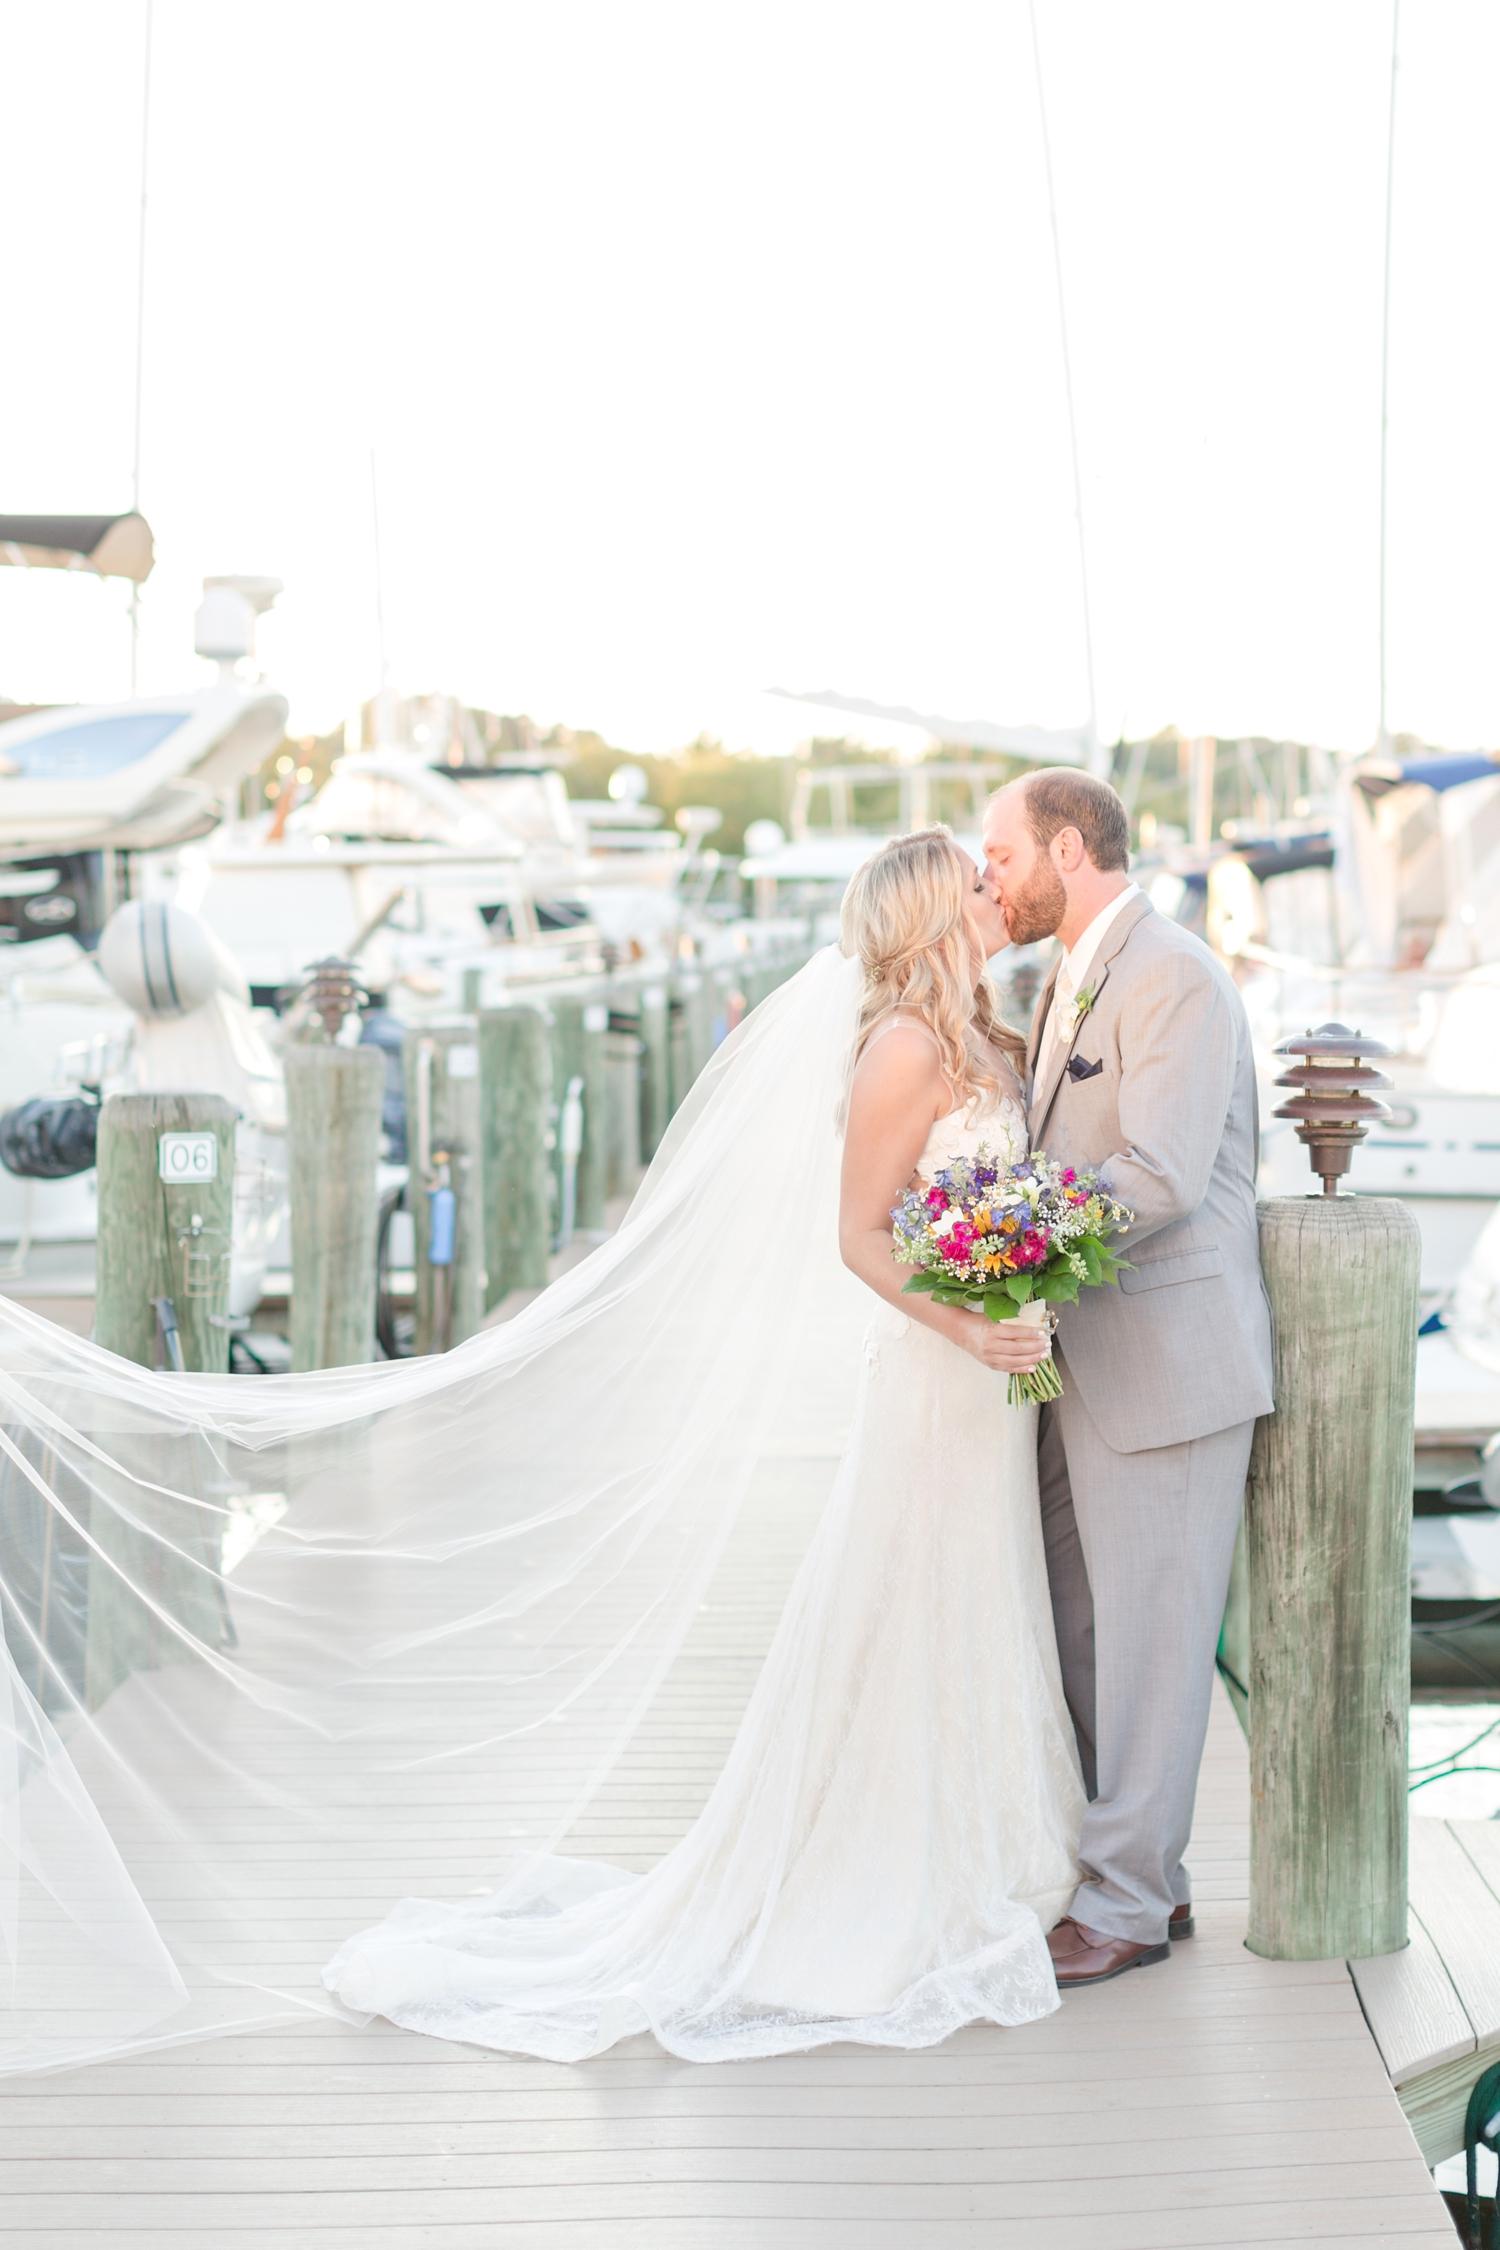 LANG WEDDING HIGHGLIGHTS-307_maryland-and-virginia-wedding-photographer-anna-grace-photography-photo.jpg